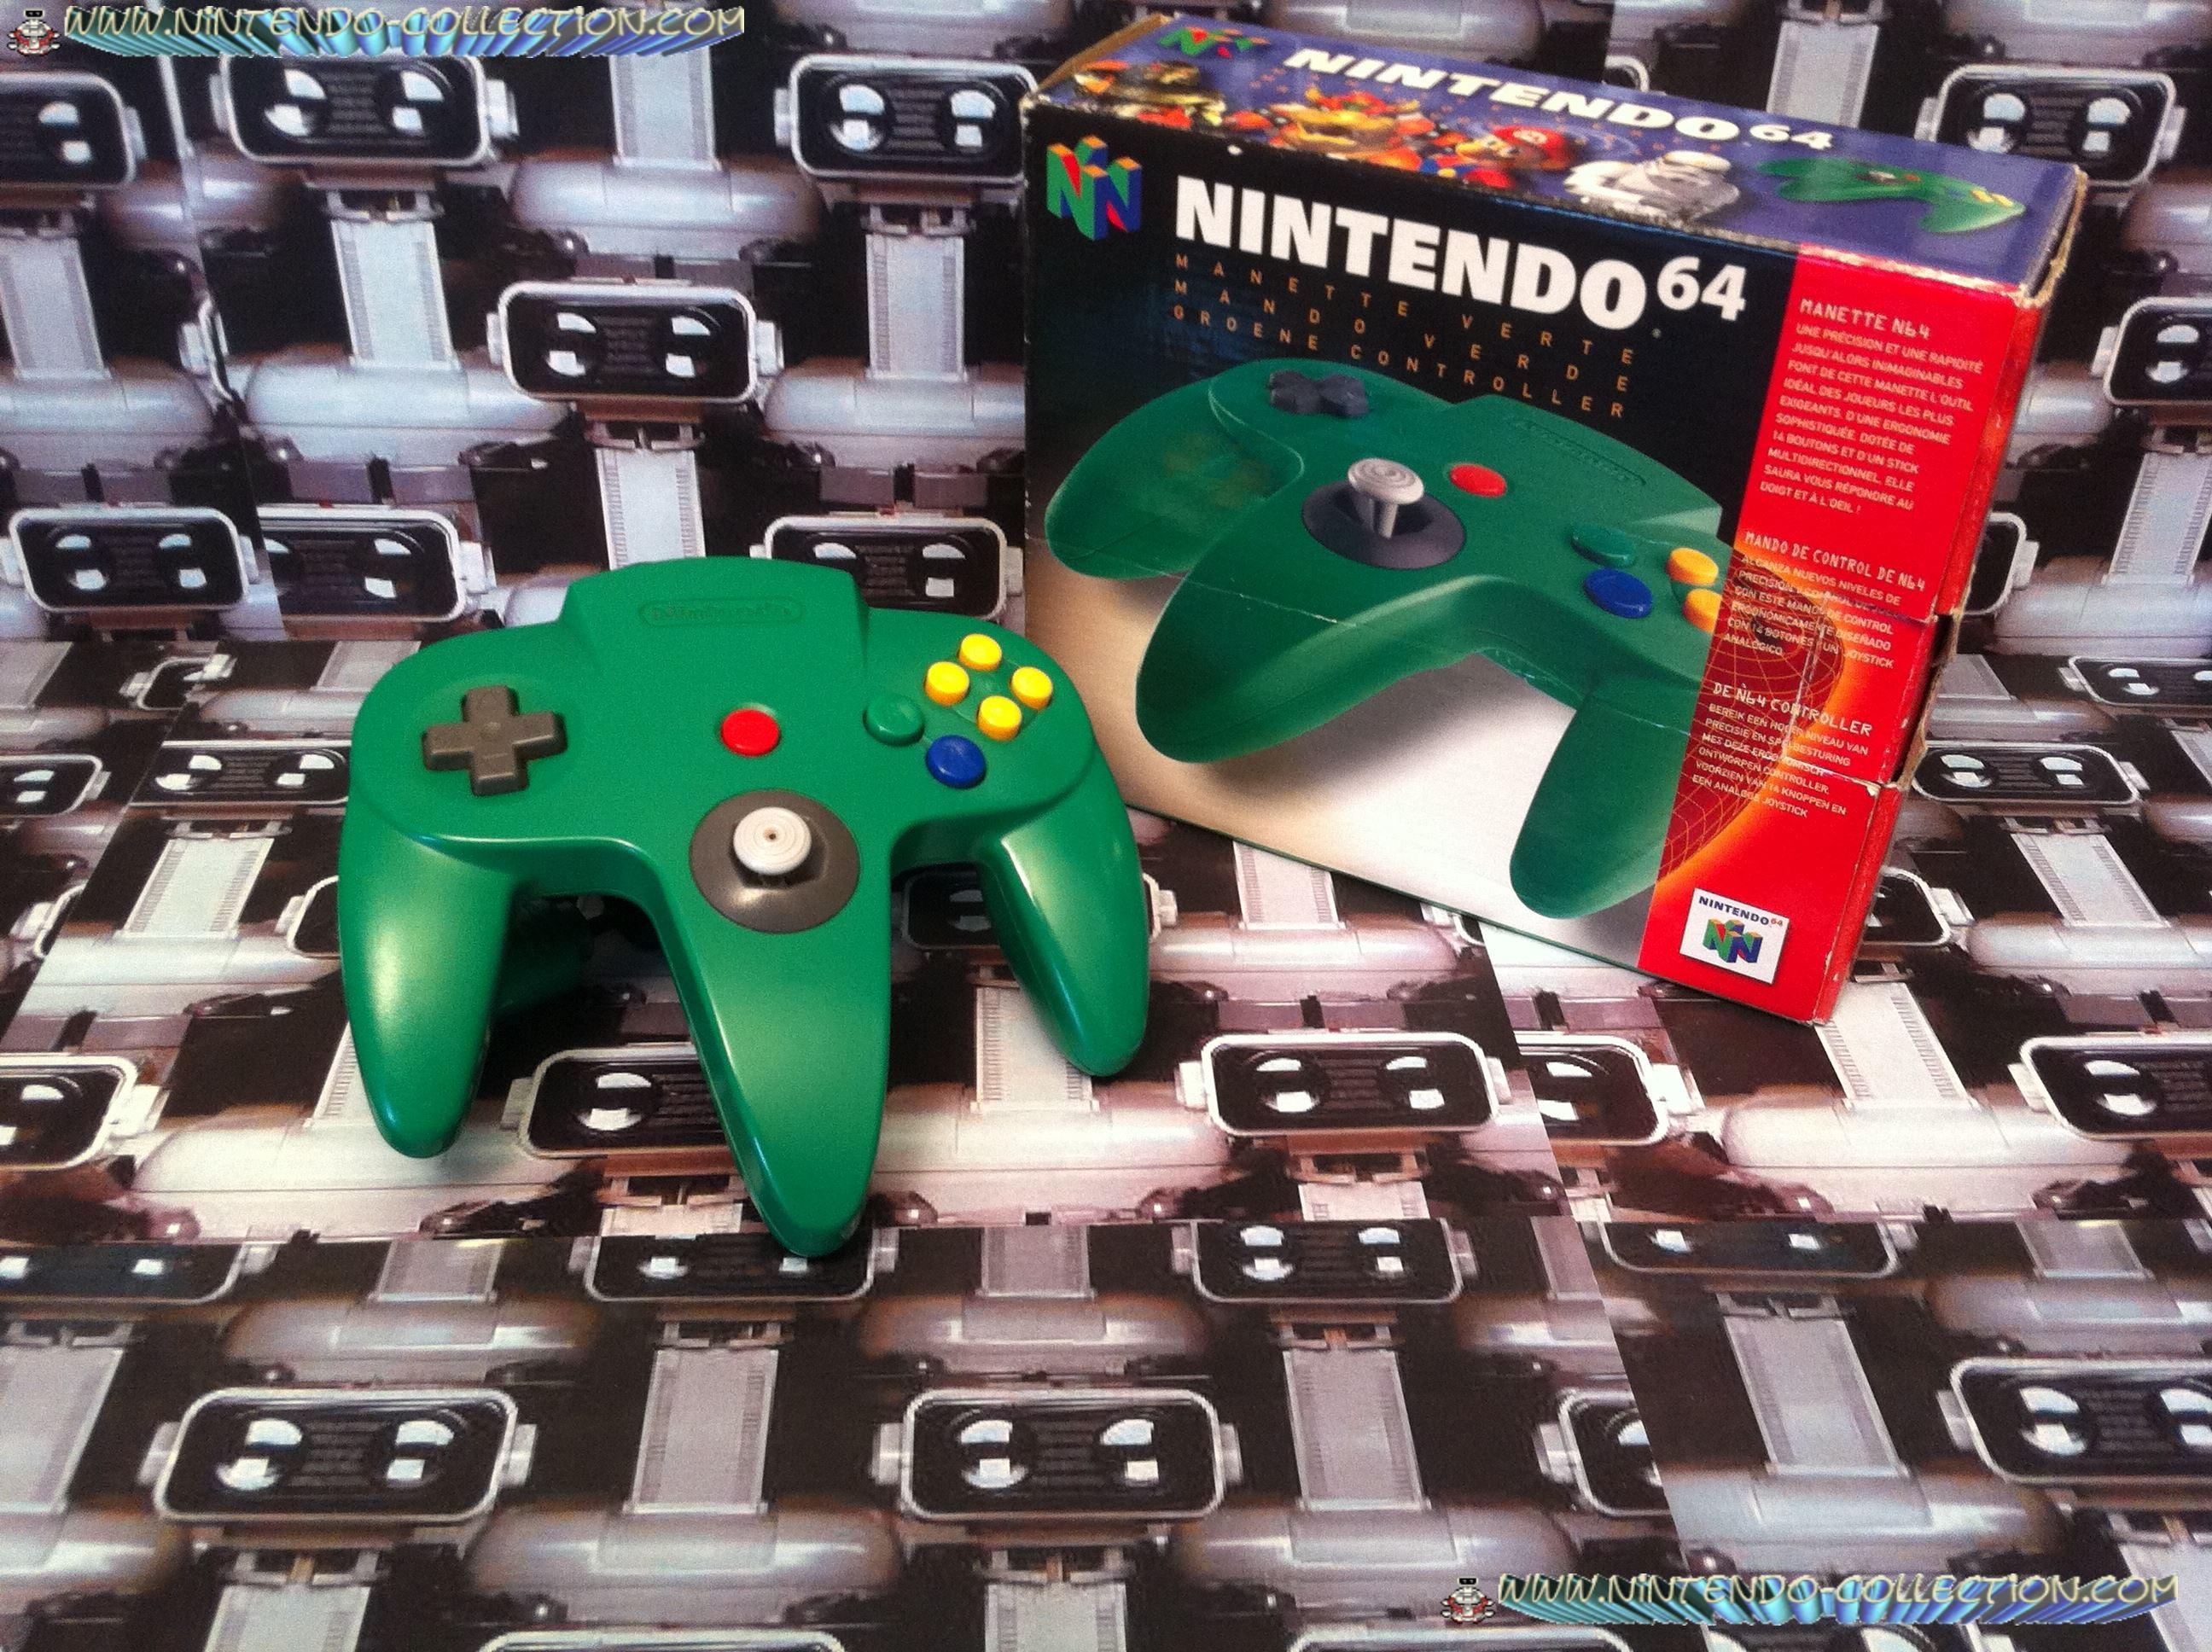 www.nintendo-collection.com  - Nintendo N64 Controller green in box - Manette  verte en boite